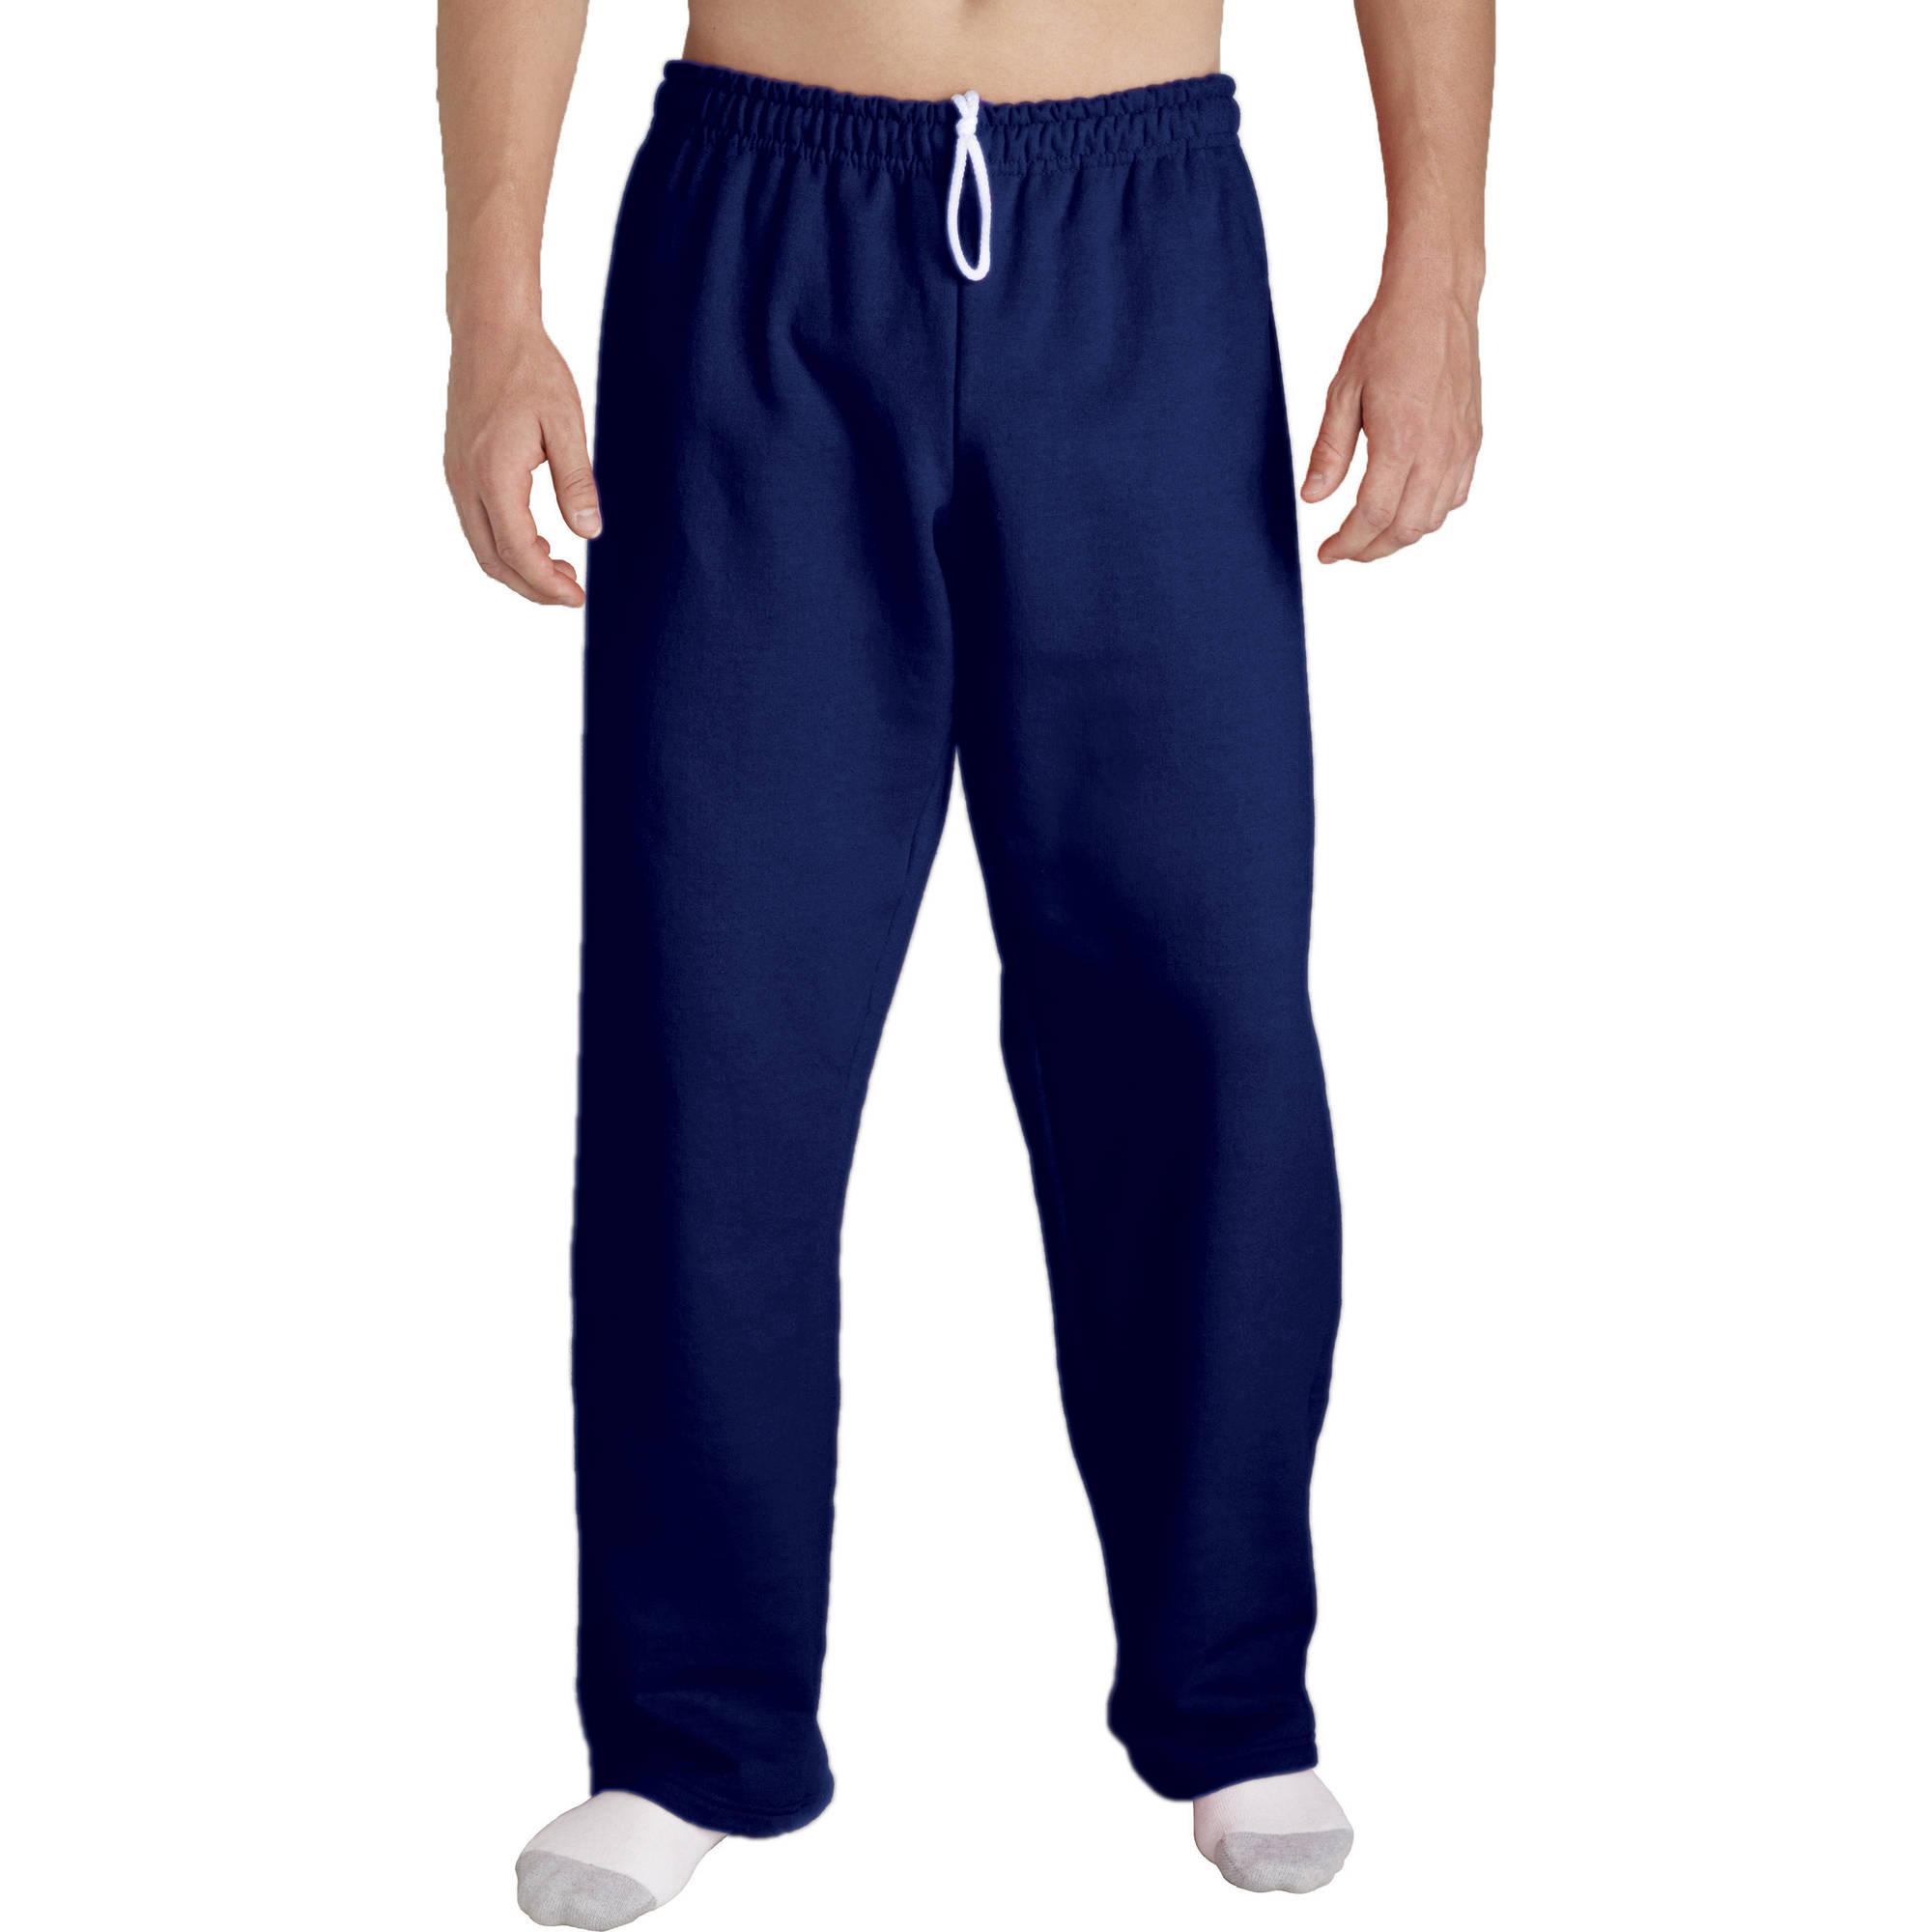 596282c21ada Gildan - Gildan Men s Open Bottom Pocketed Sweatpant - Walmart.com